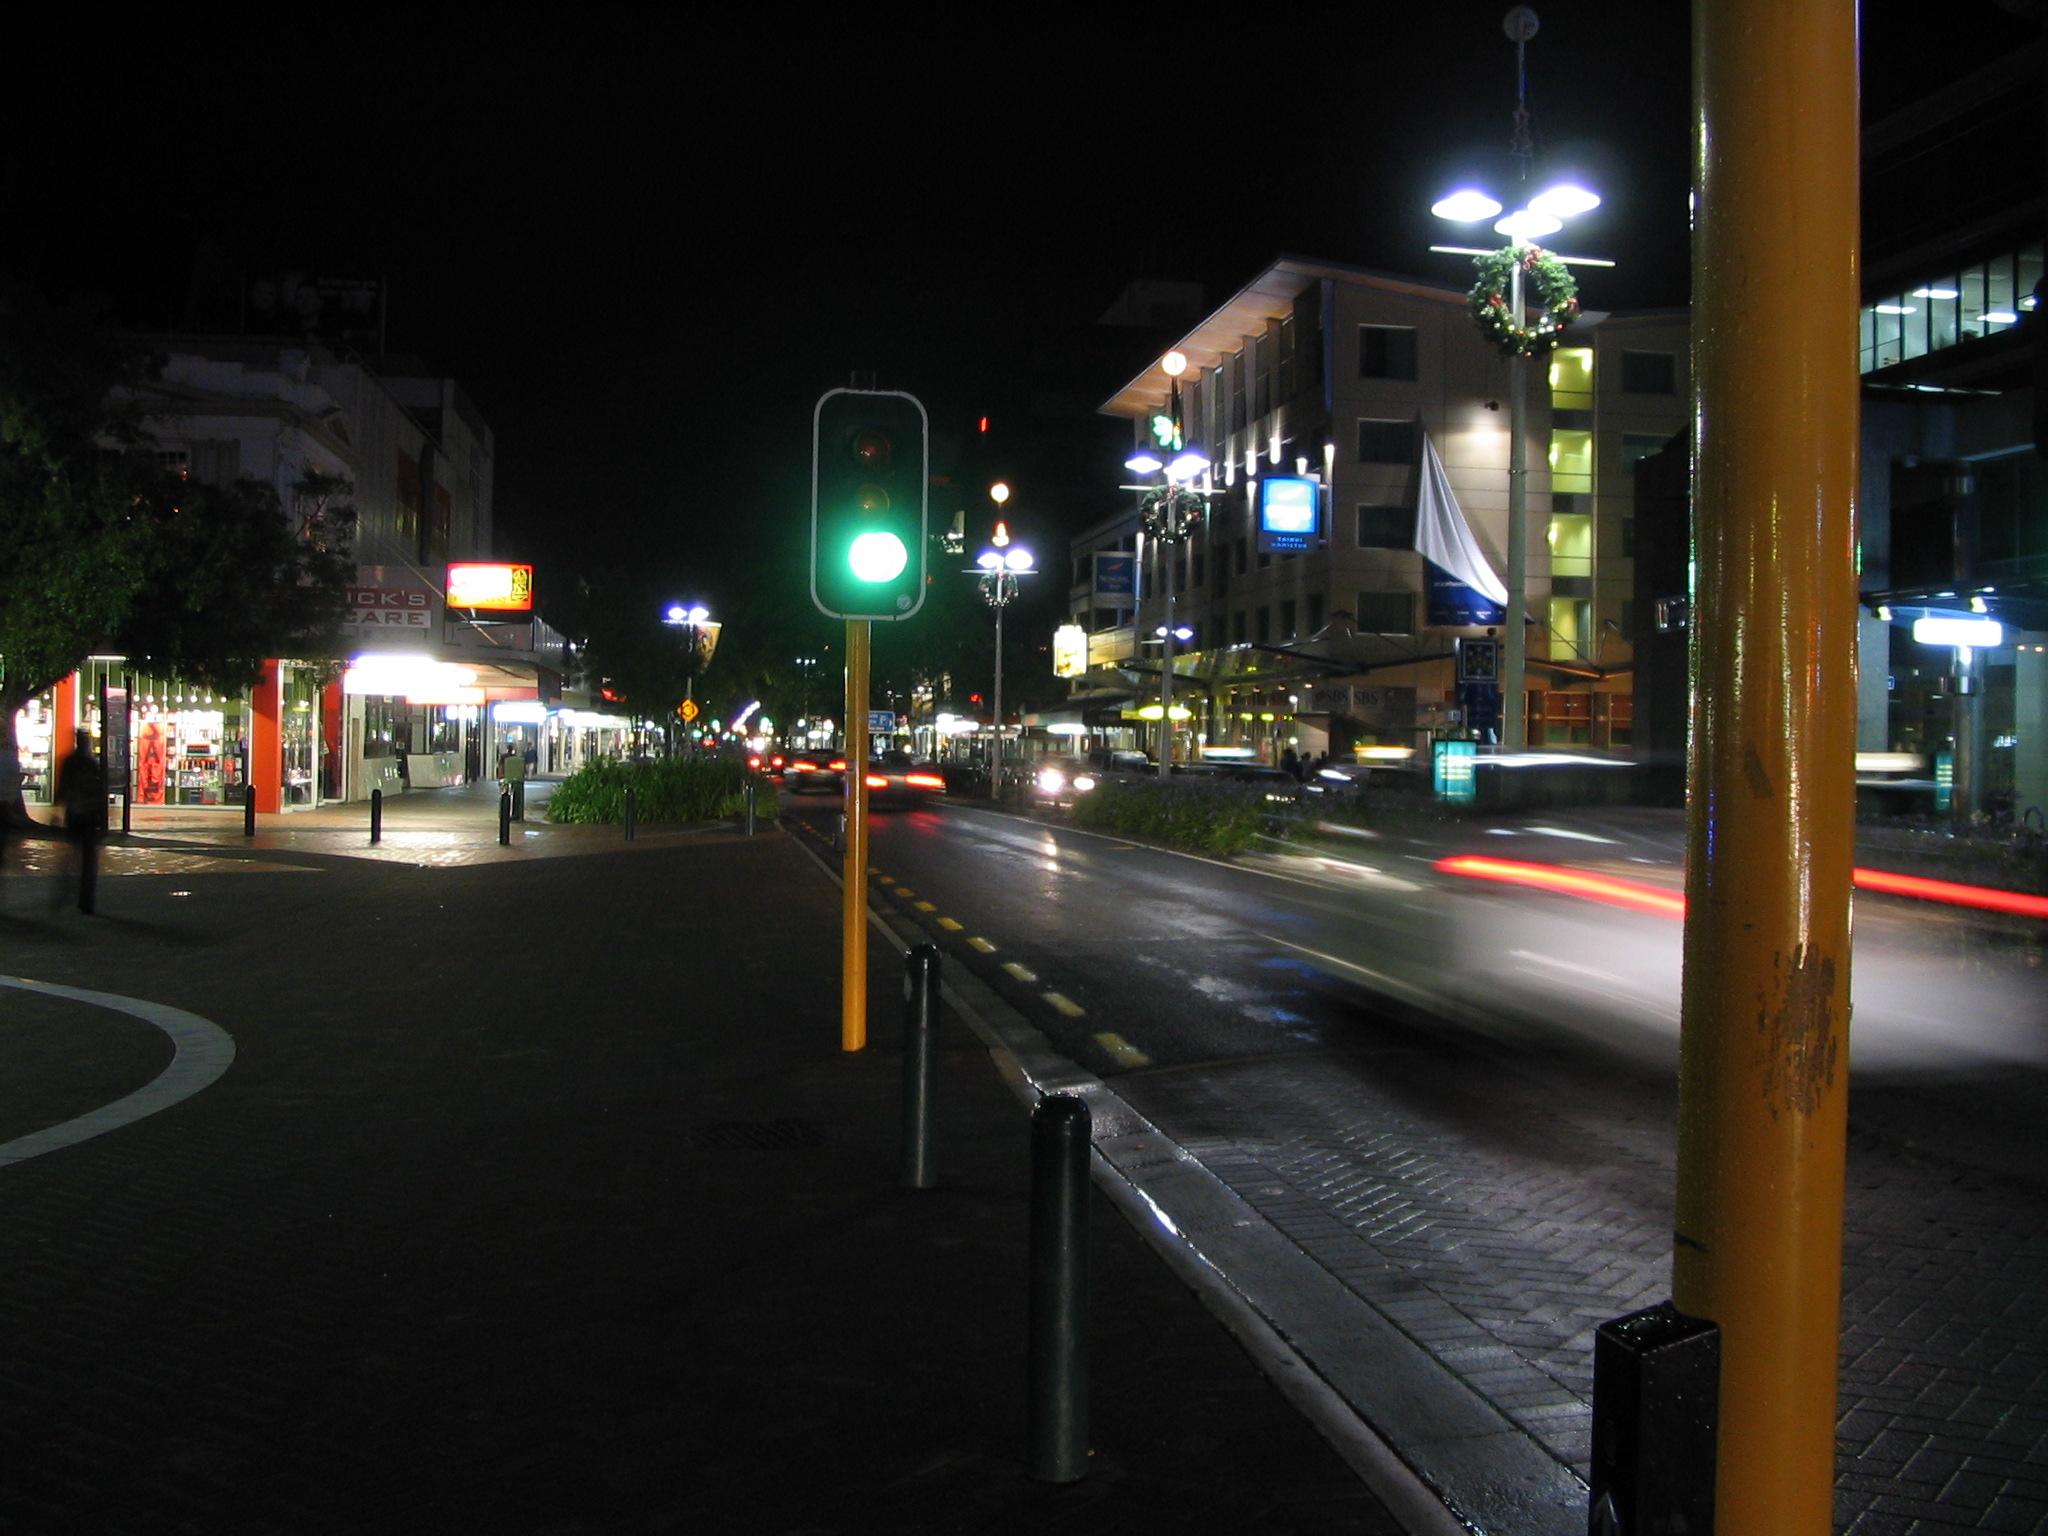 Alfa img showing gt street night time